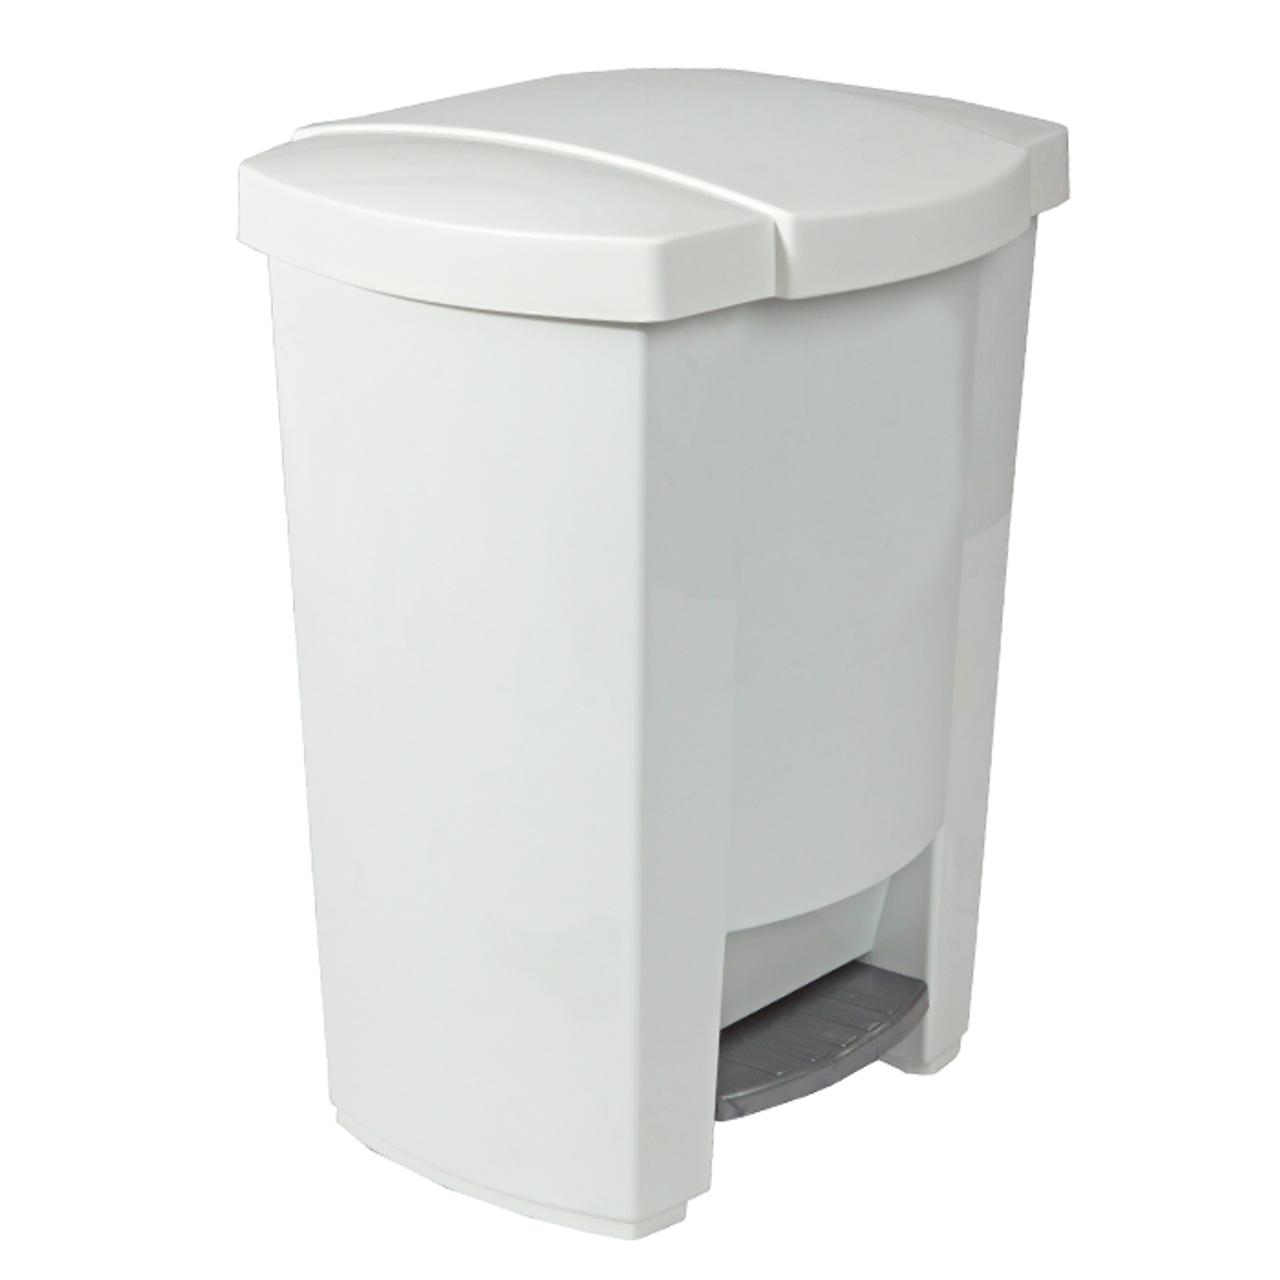 kitchen waste bins | slim garbage can | garbage can | trash bin